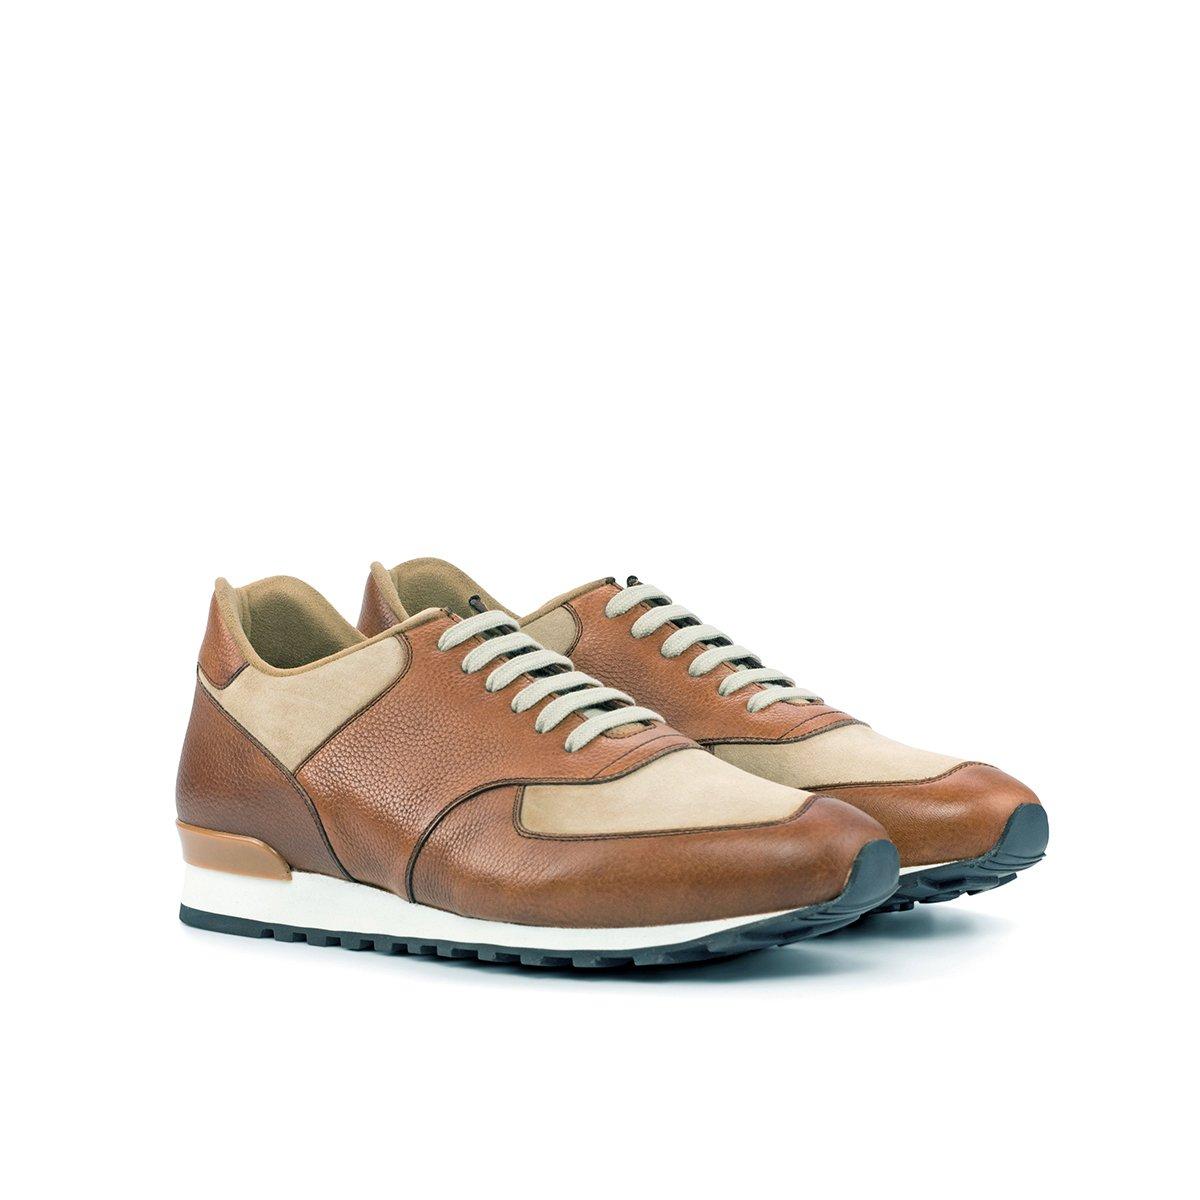 Jogger Sneaker - Kid Suede Taupe Med Brown-Beige